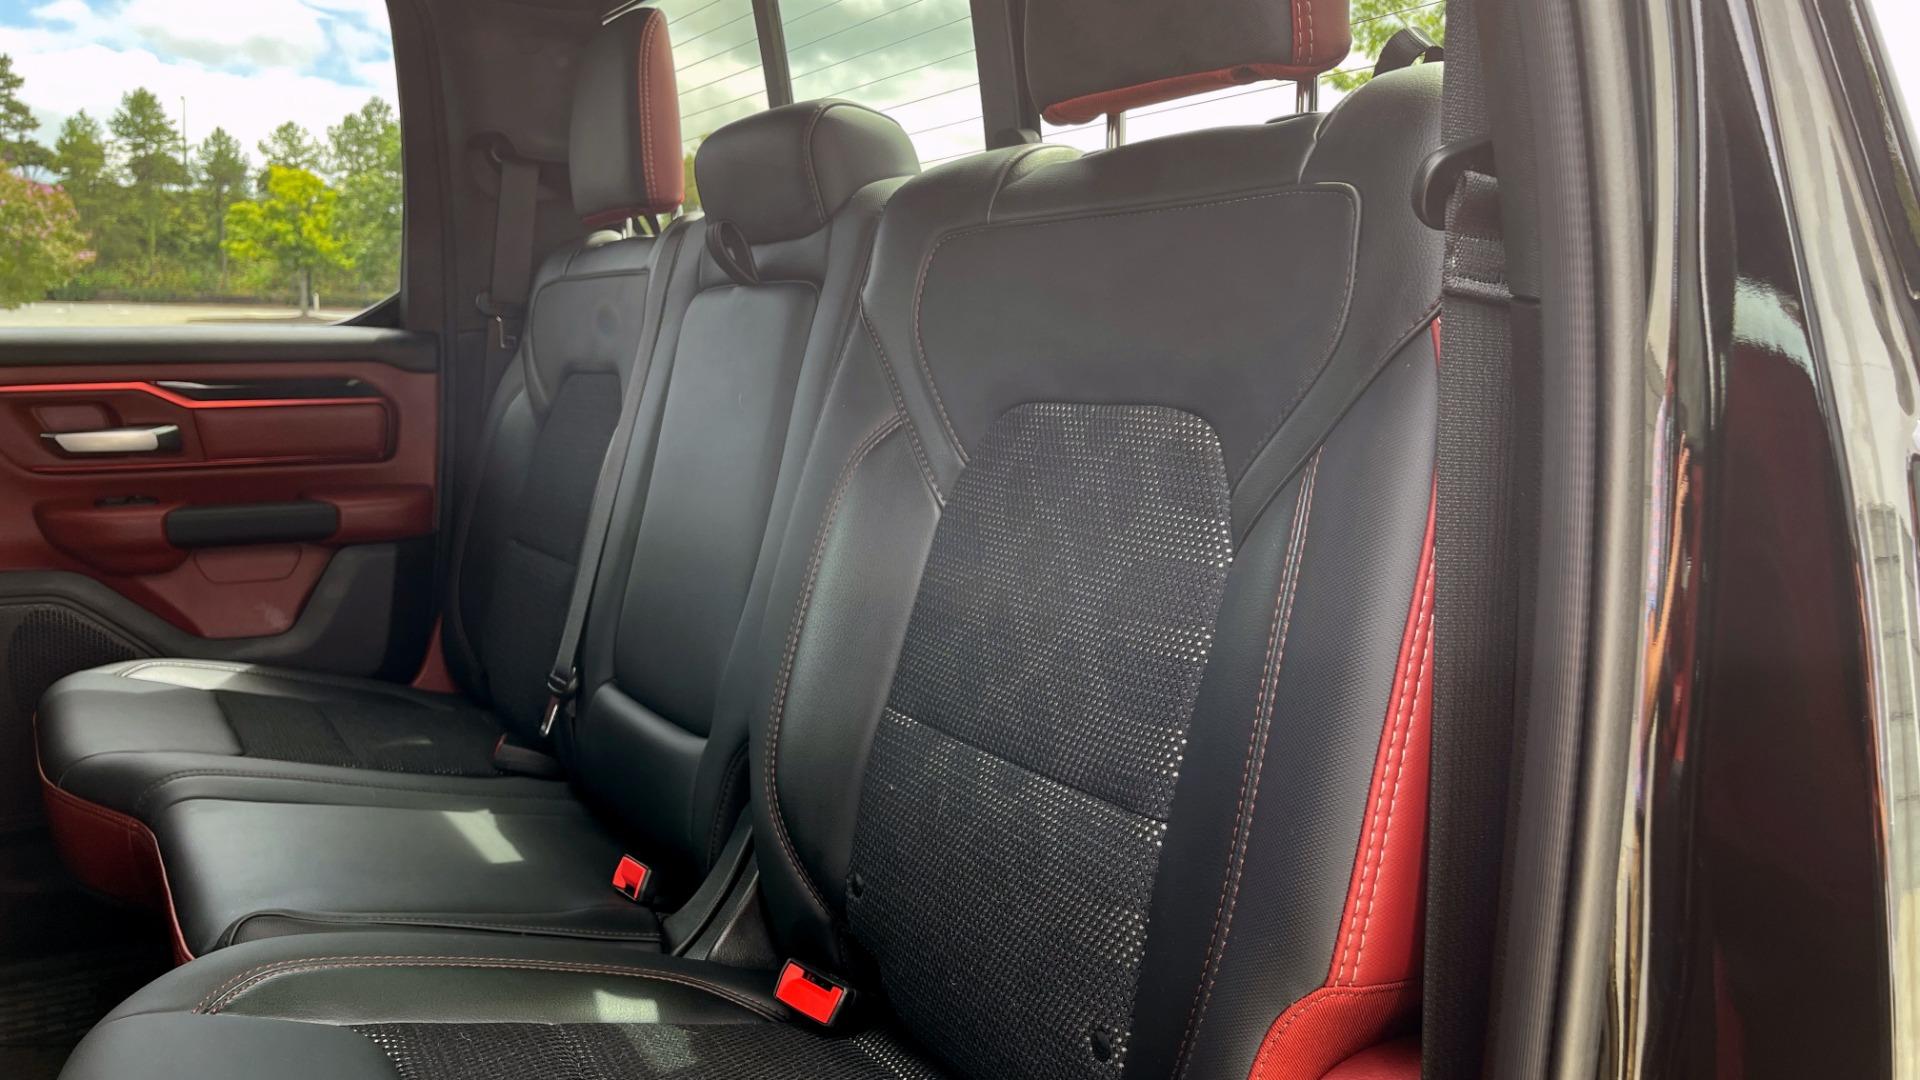 Used 2019 Ram 1500 REBEL QUADCAB 4X4 / 5.7L HEMI / 8-SPD AUTO / REMOTE START / PARK ASSIST for sale $44,495 at Formula Imports in Charlotte NC 28227 54